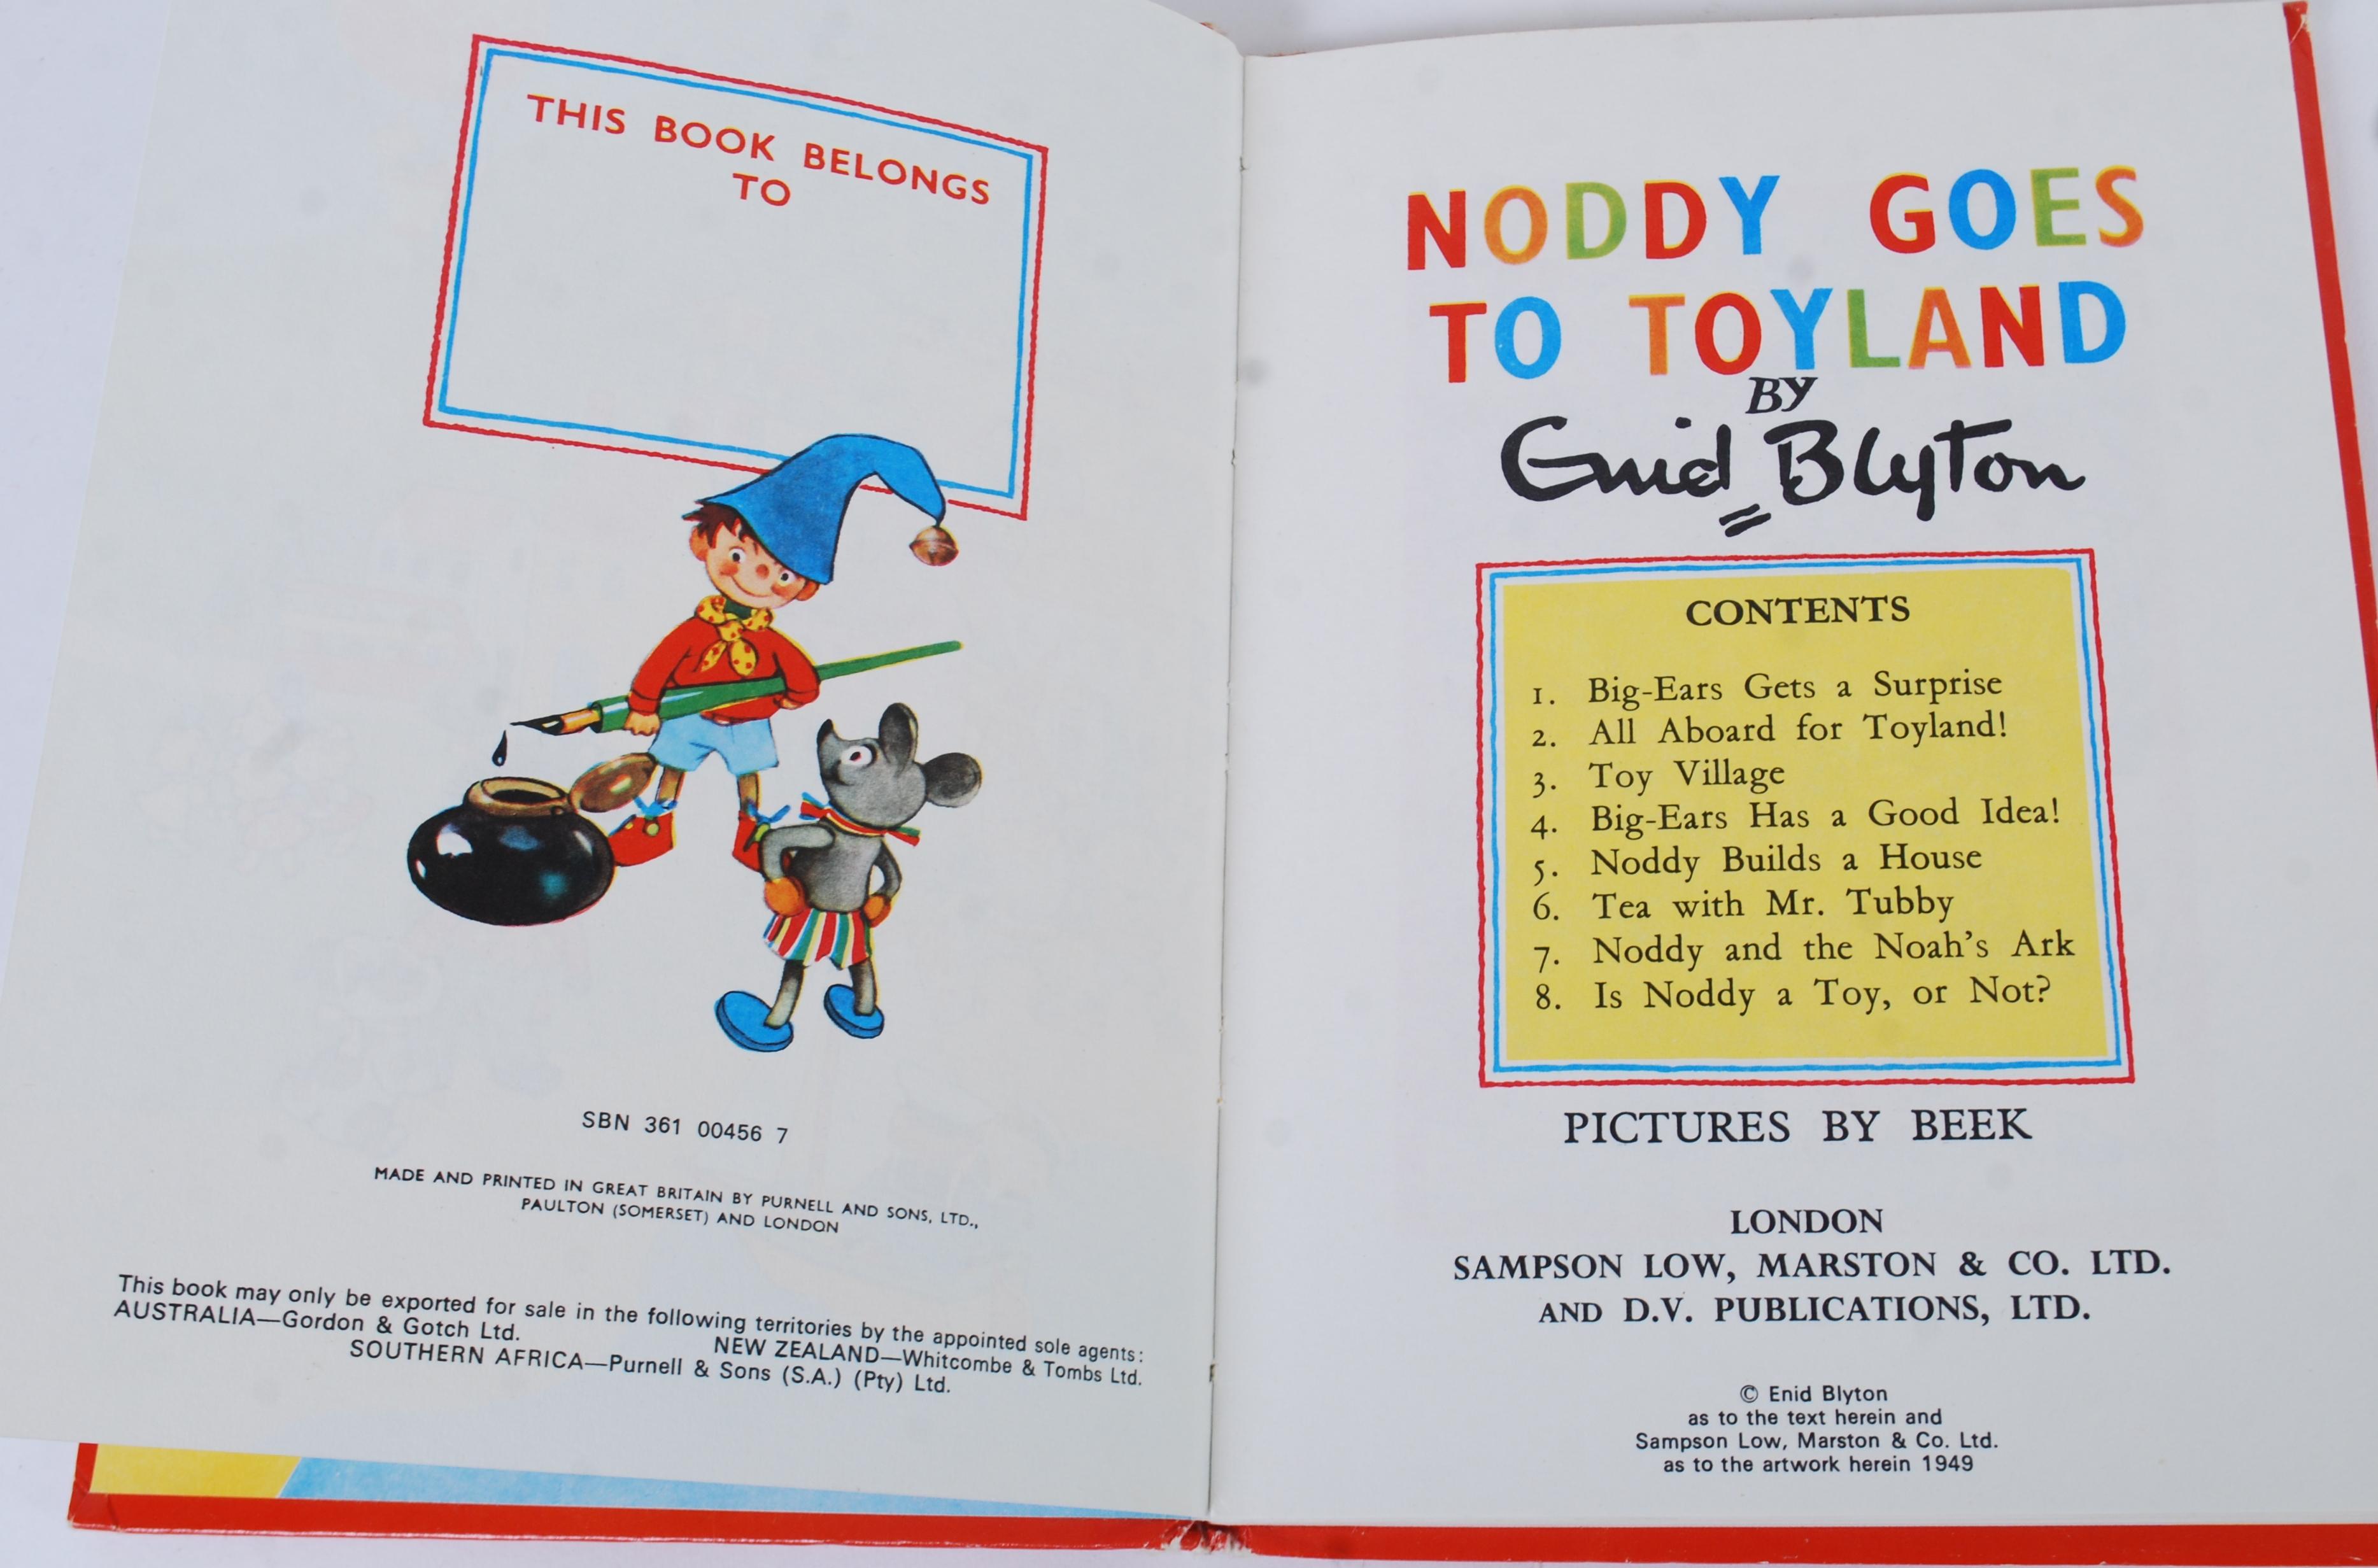 Enid Blyton Lot of 21 Vintage Books - Good to Very Good